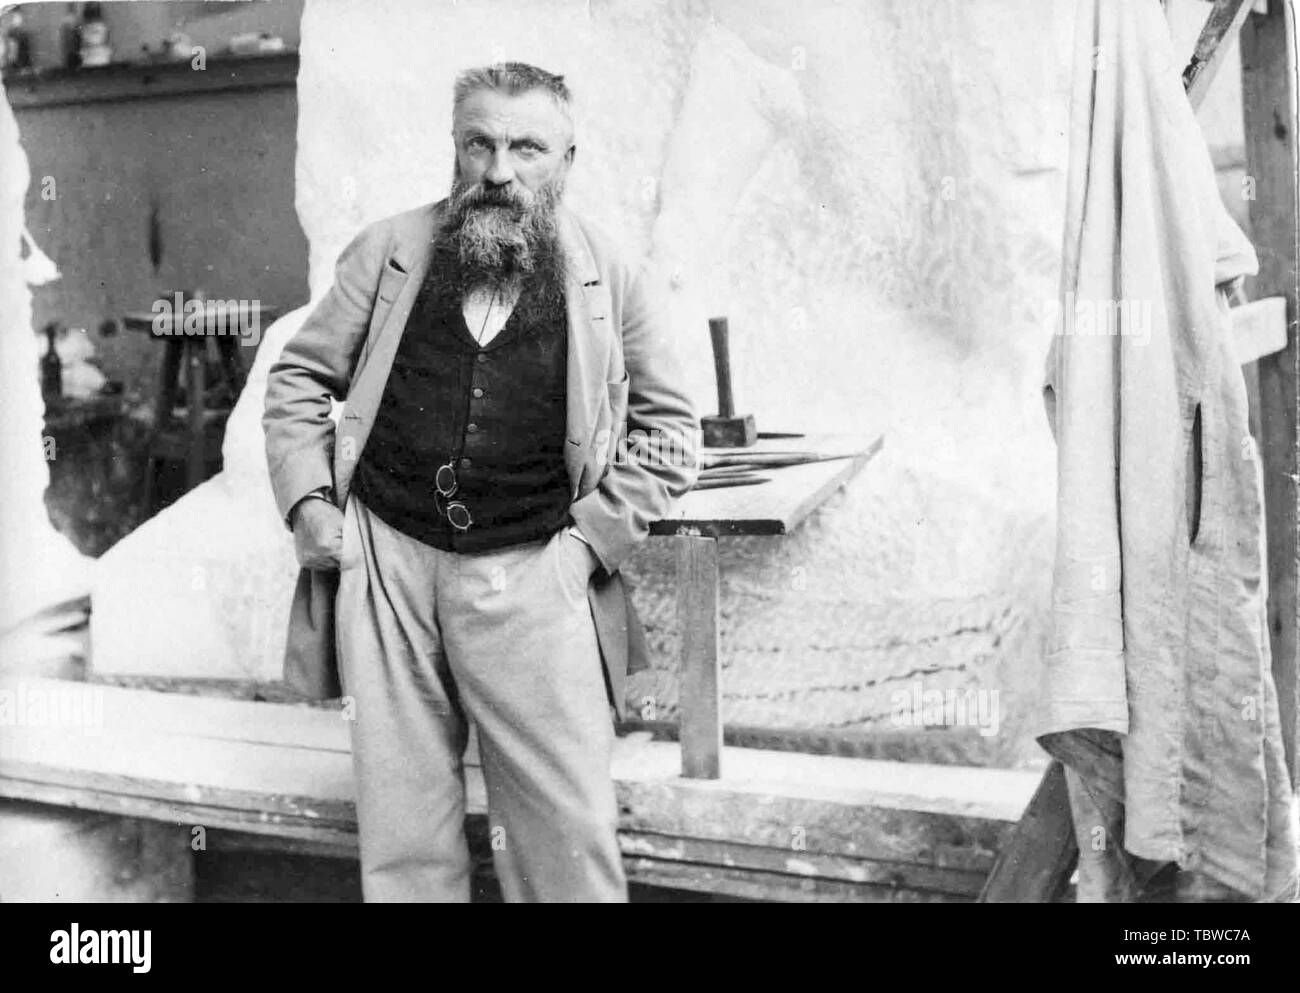 Auguste Rodin, In his Studio, portrait photograph, 1898 - Stock Image